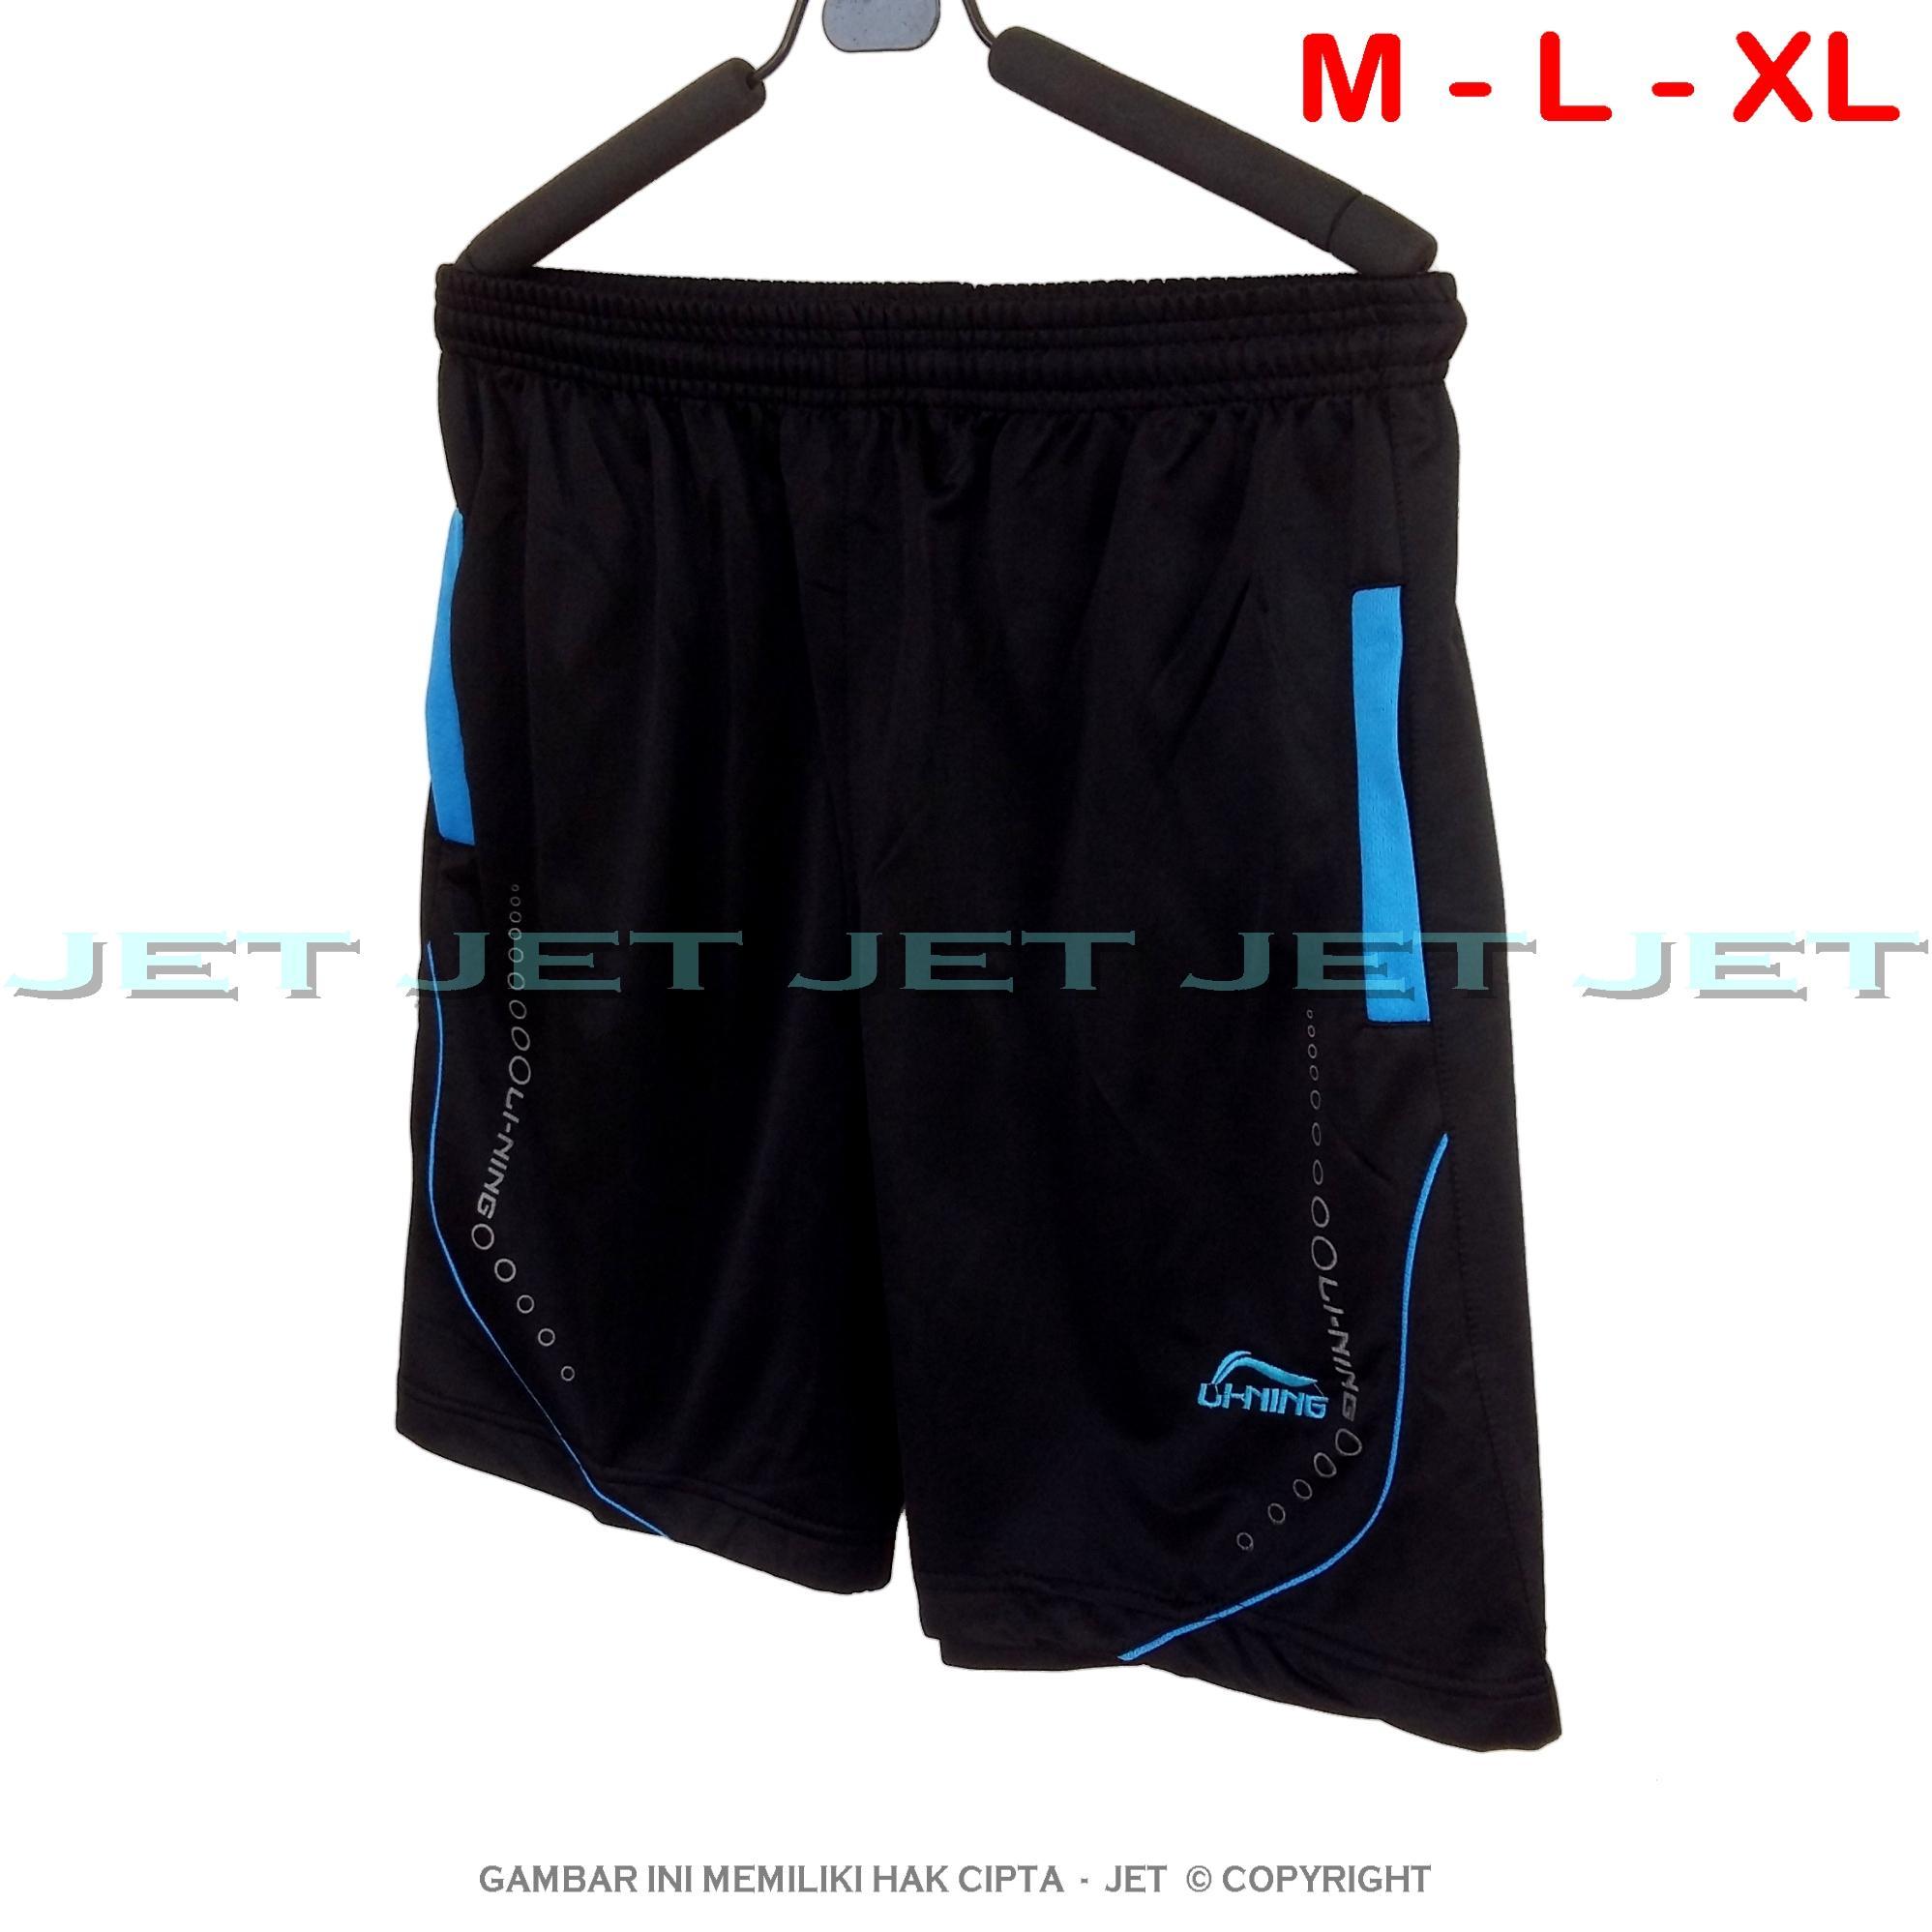 Celana Panjang Pendek Olahraga Pria Nike Pro Combat Shortpant Ketat Jet Santai M L Xl Sport Bahan Lotto Pakaian